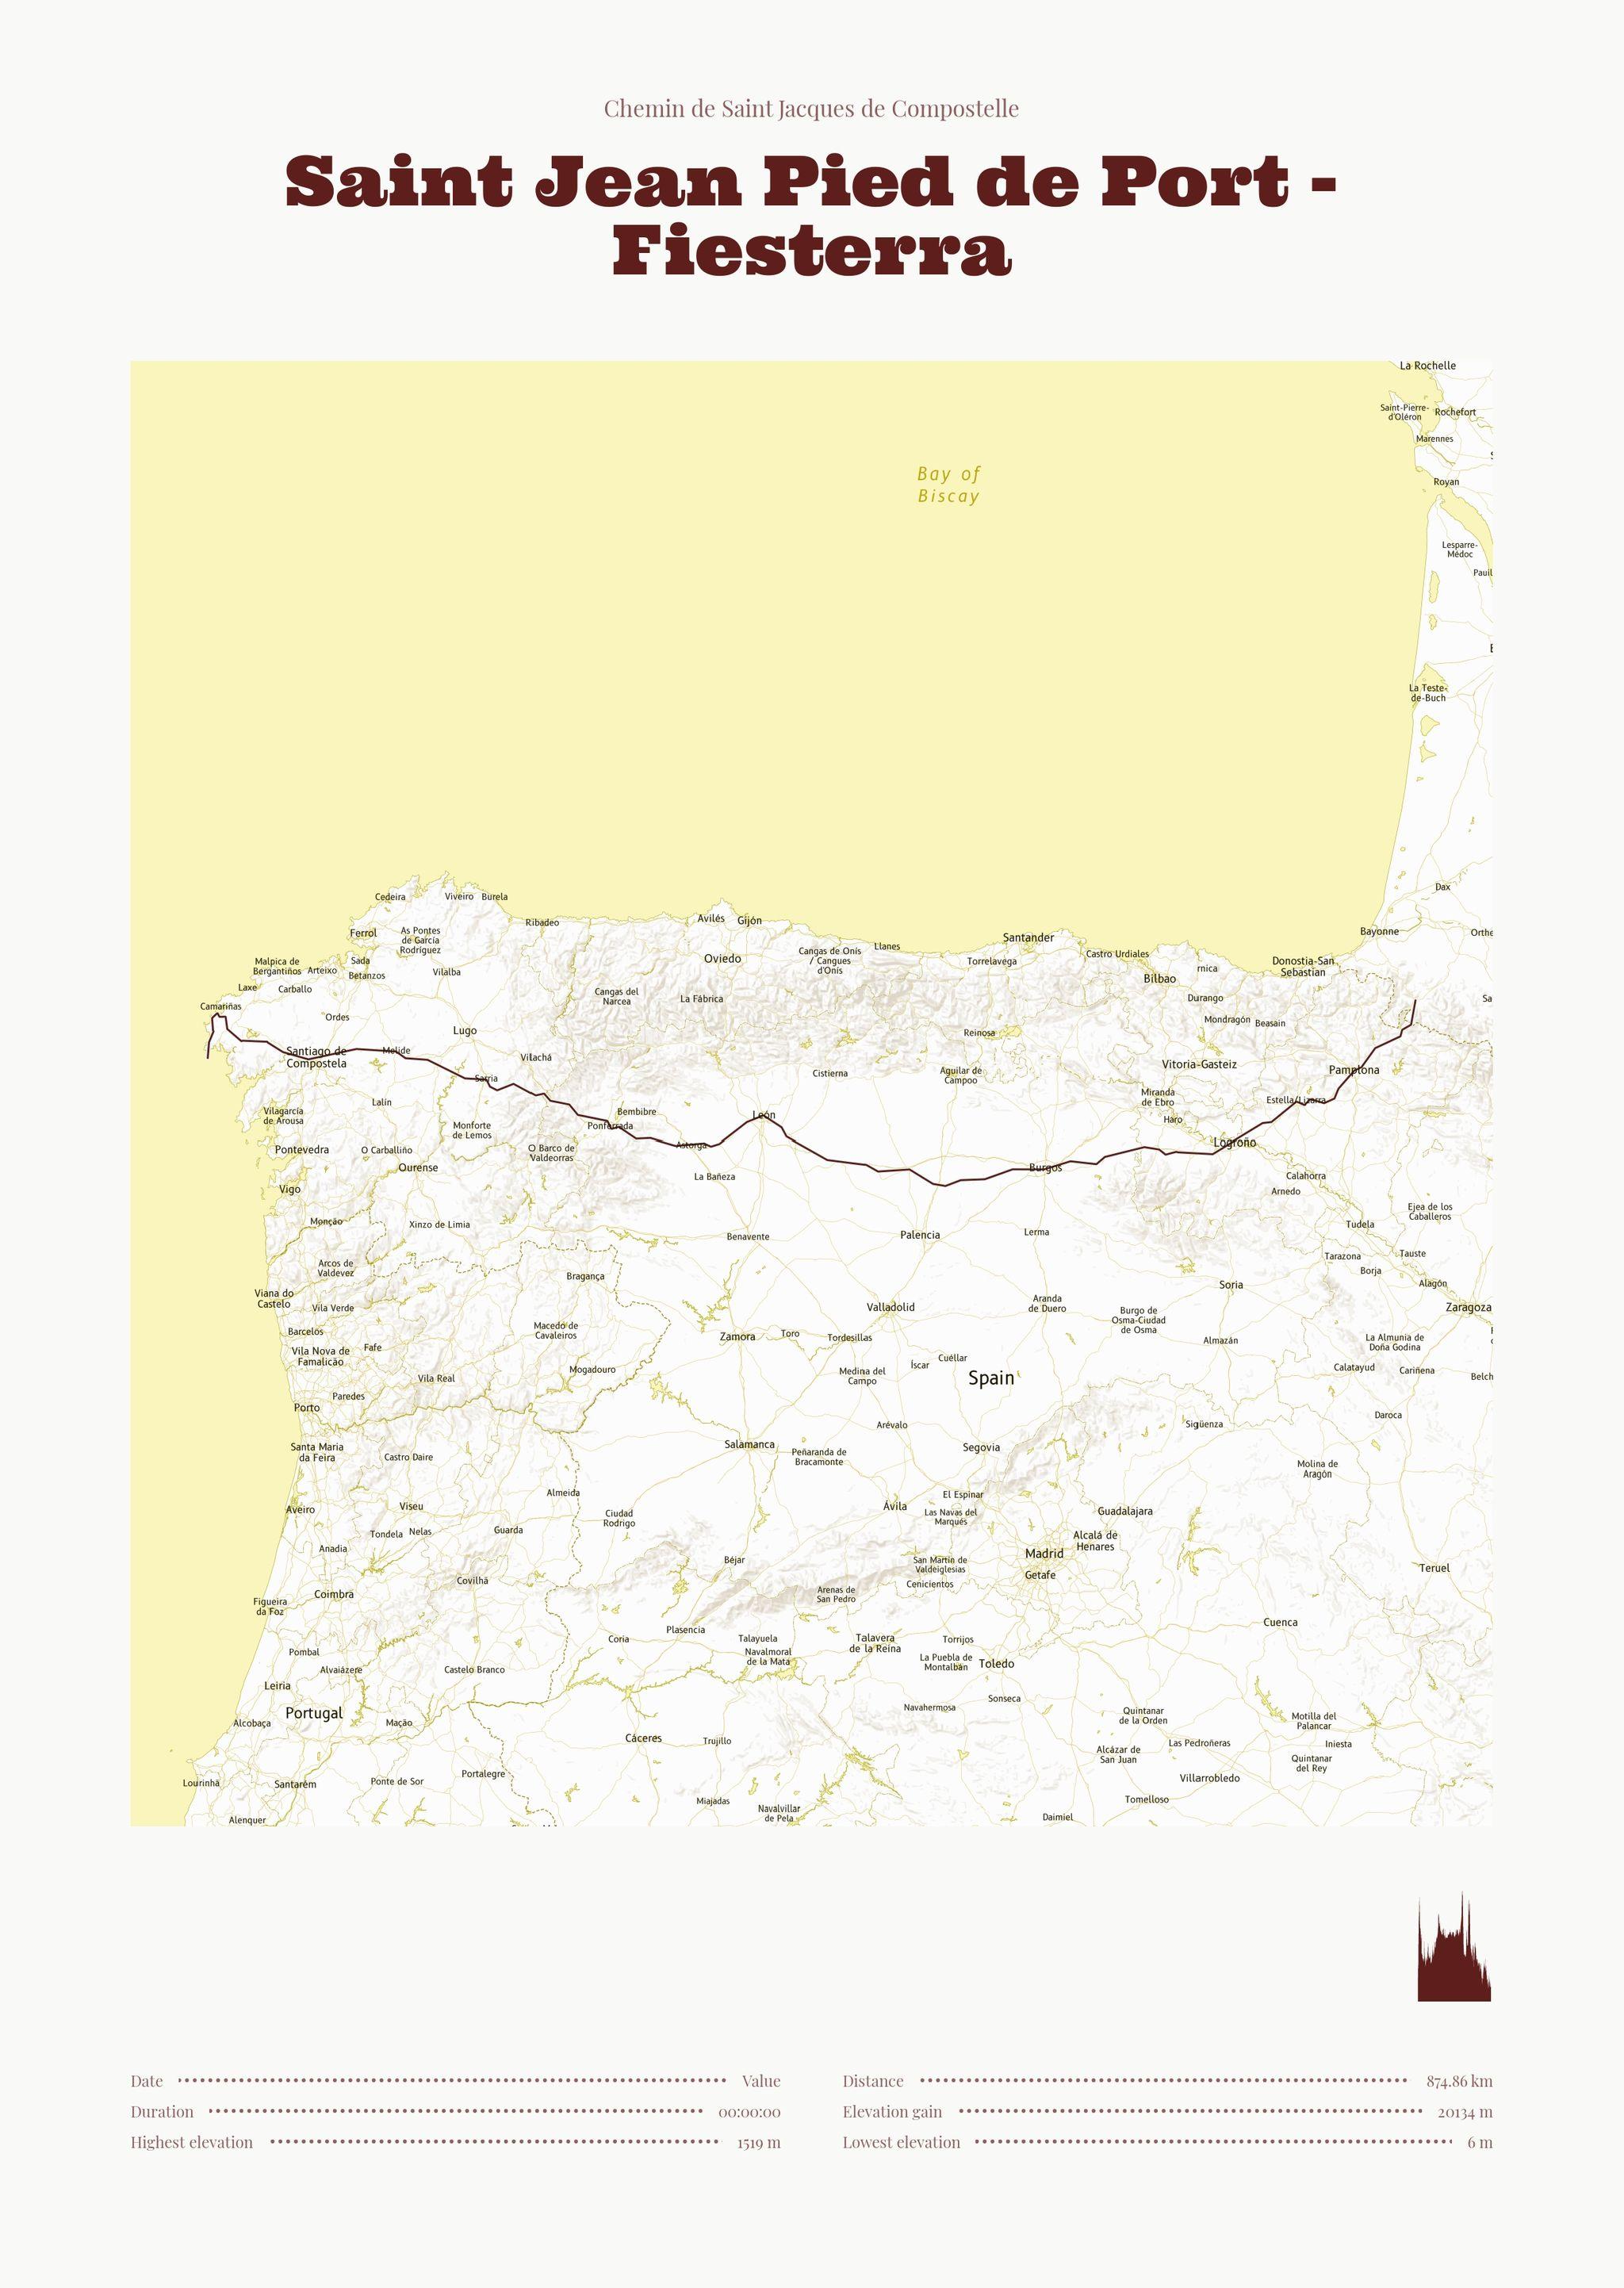 poster-Saint Jean Pied de Port - Fiesterra